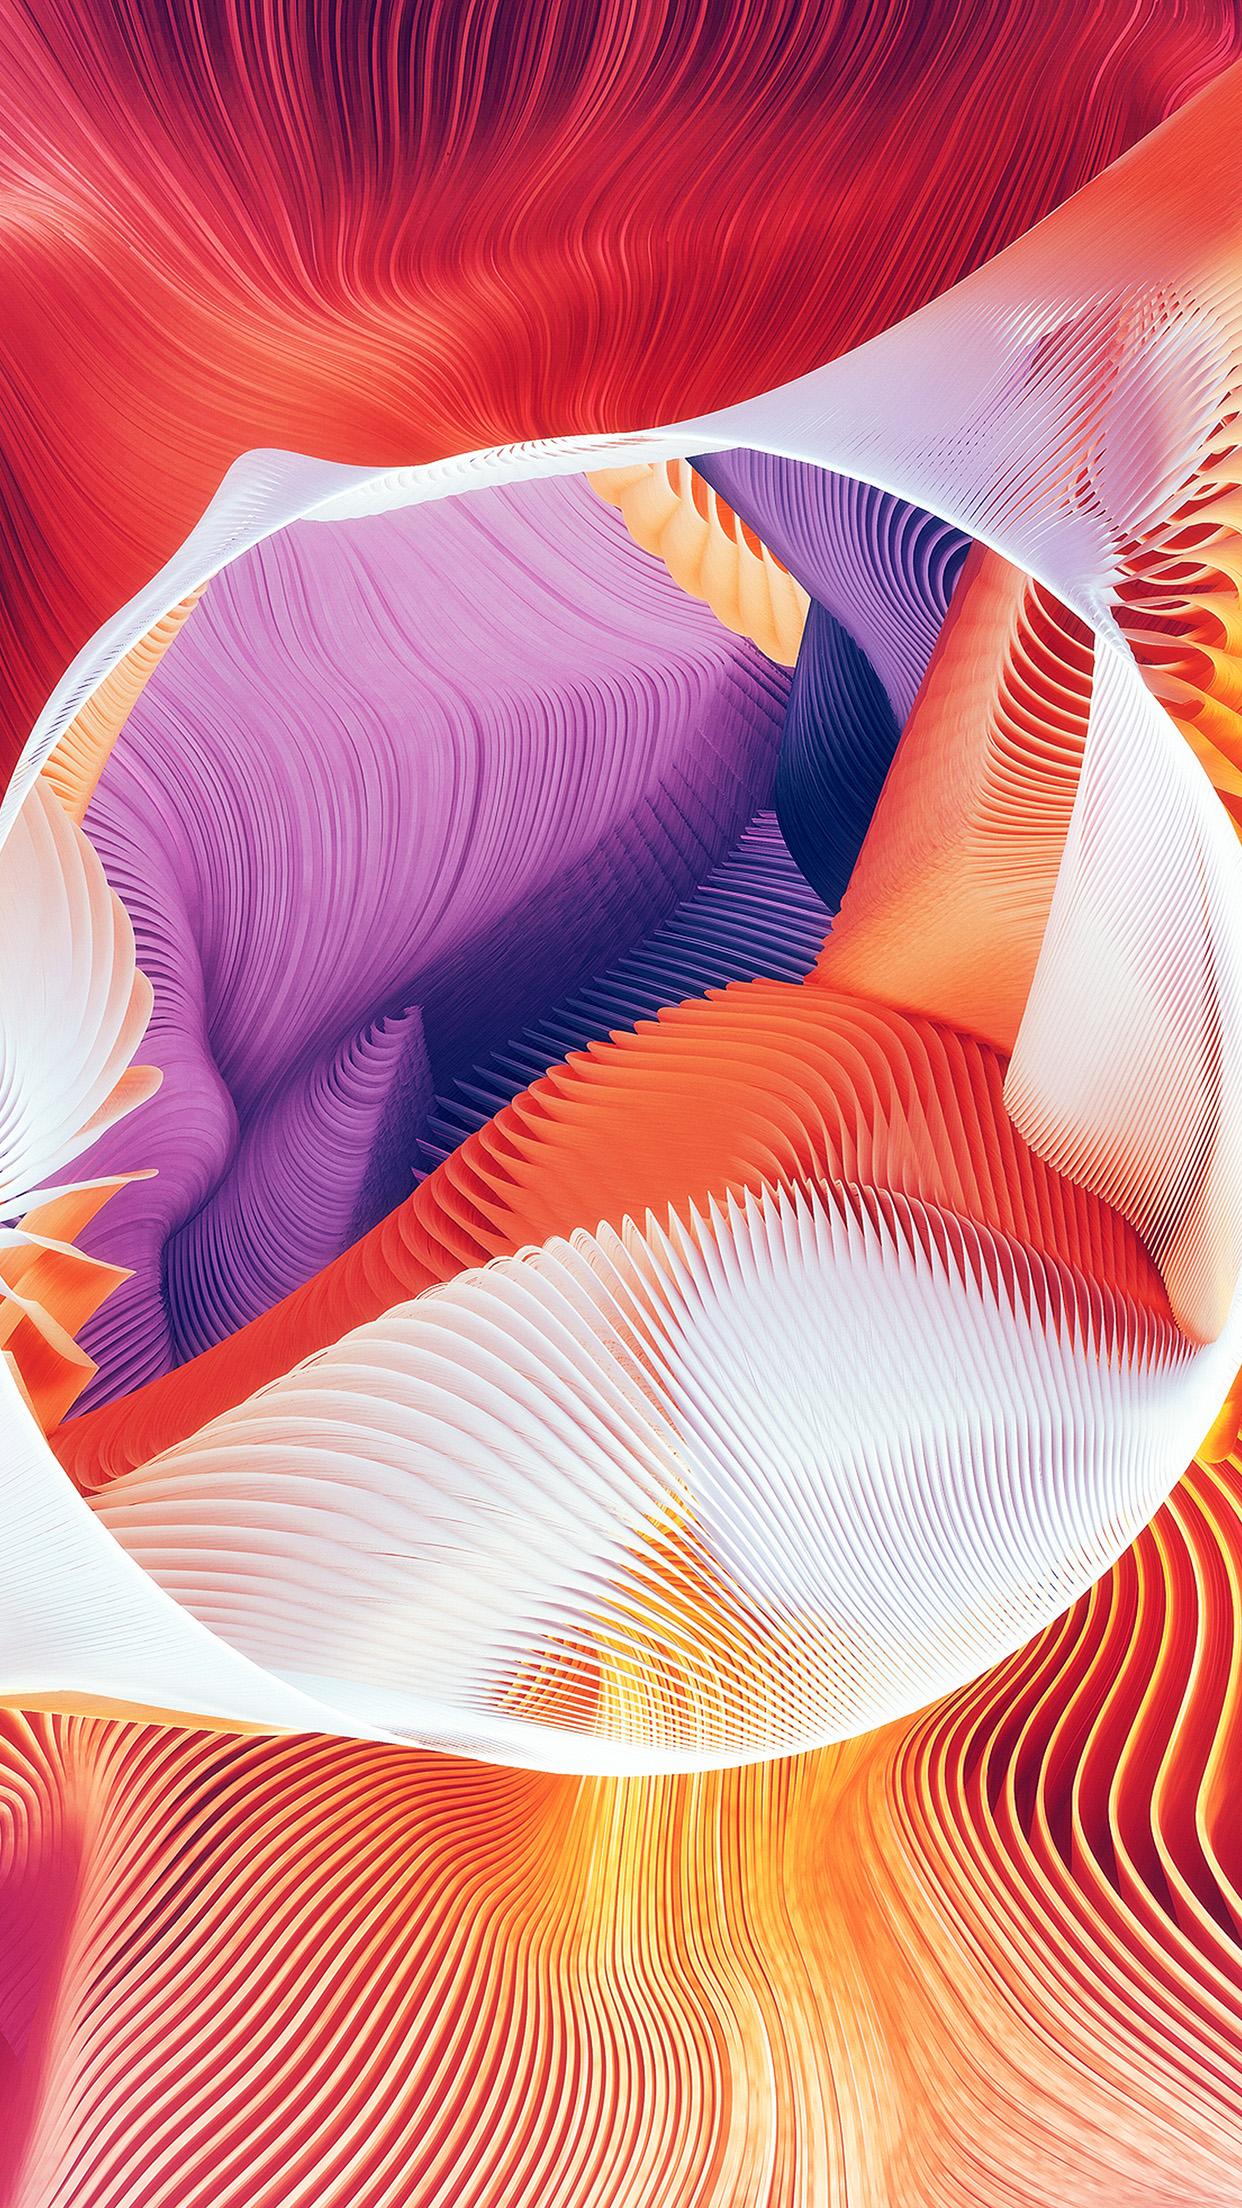 Fall Desktop Wallpaper Mac Papers Co Iphone Wallpaper Ar69 Plums Ari Weinkle Art